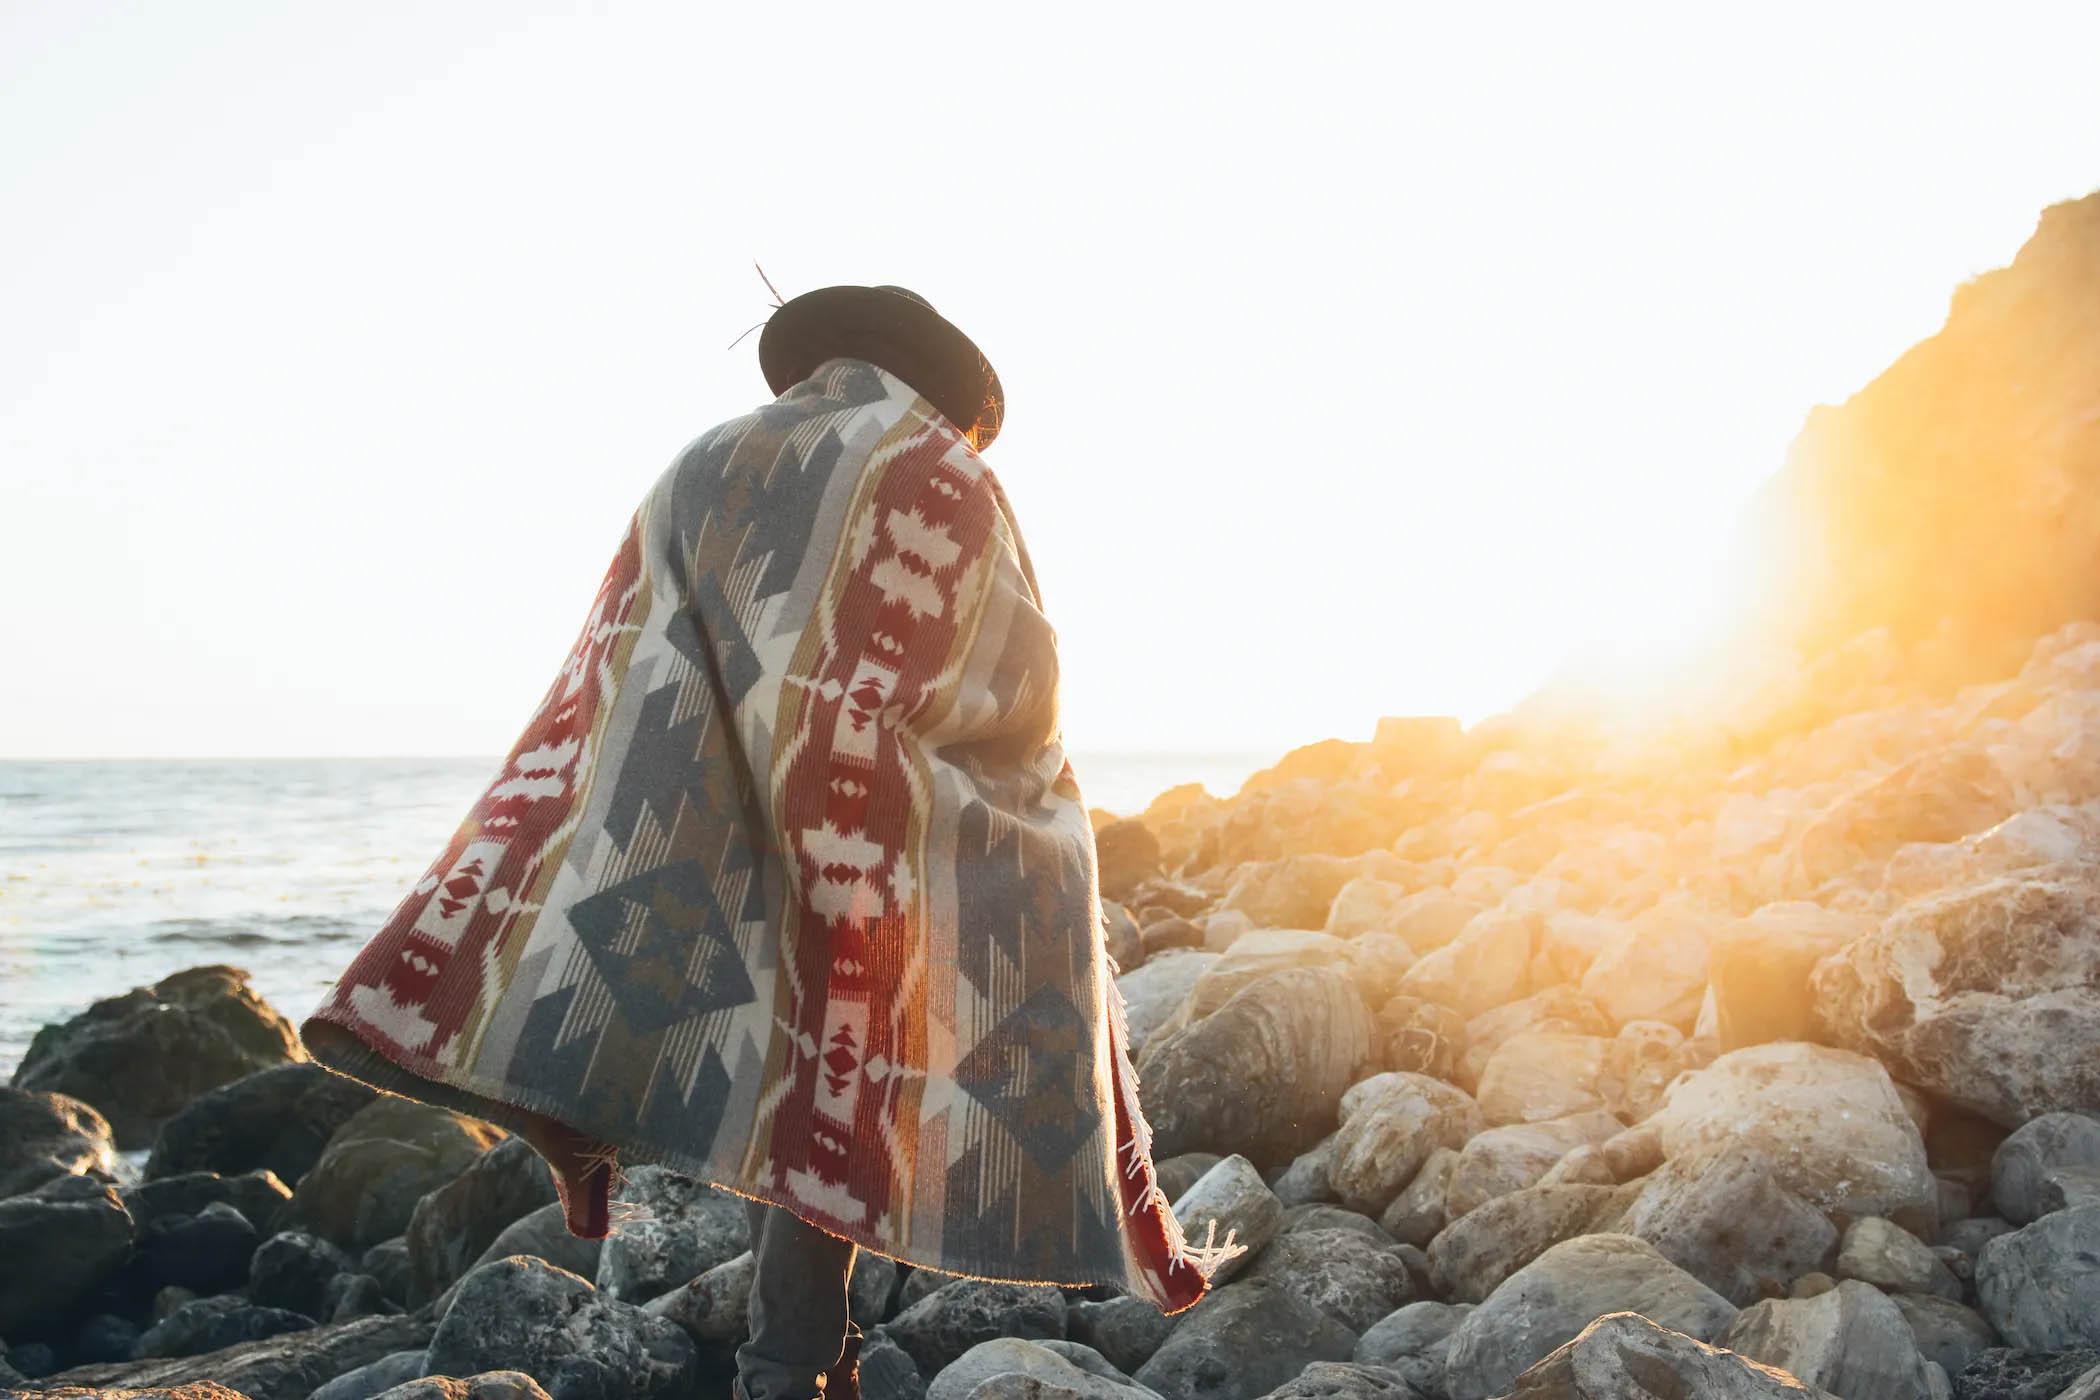 Sackcloth & Ashes Introduces Native-American Artist Designed Blanket